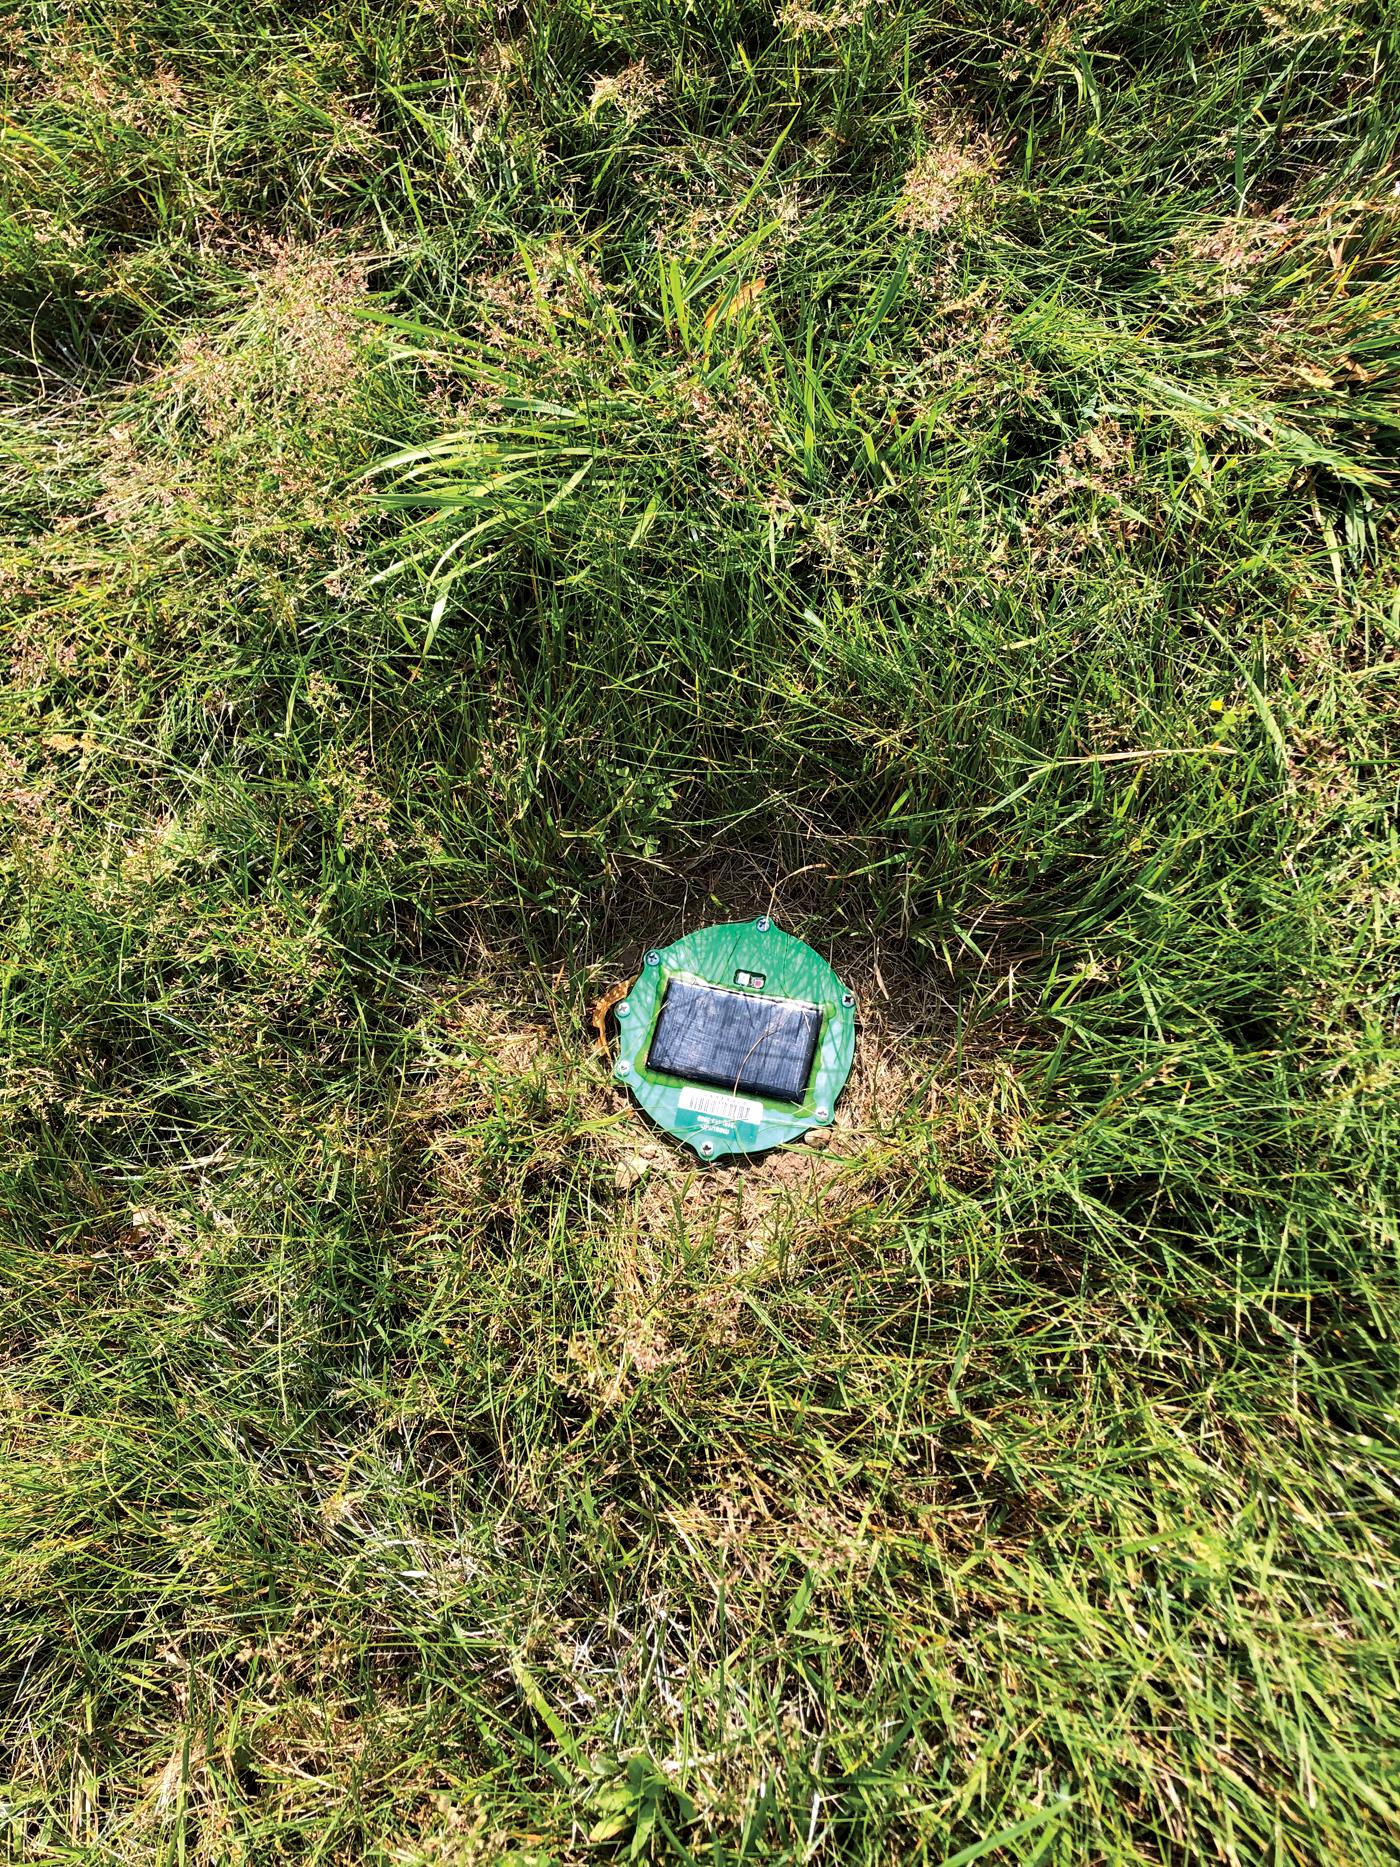 Photo of round sensor stuck into turf